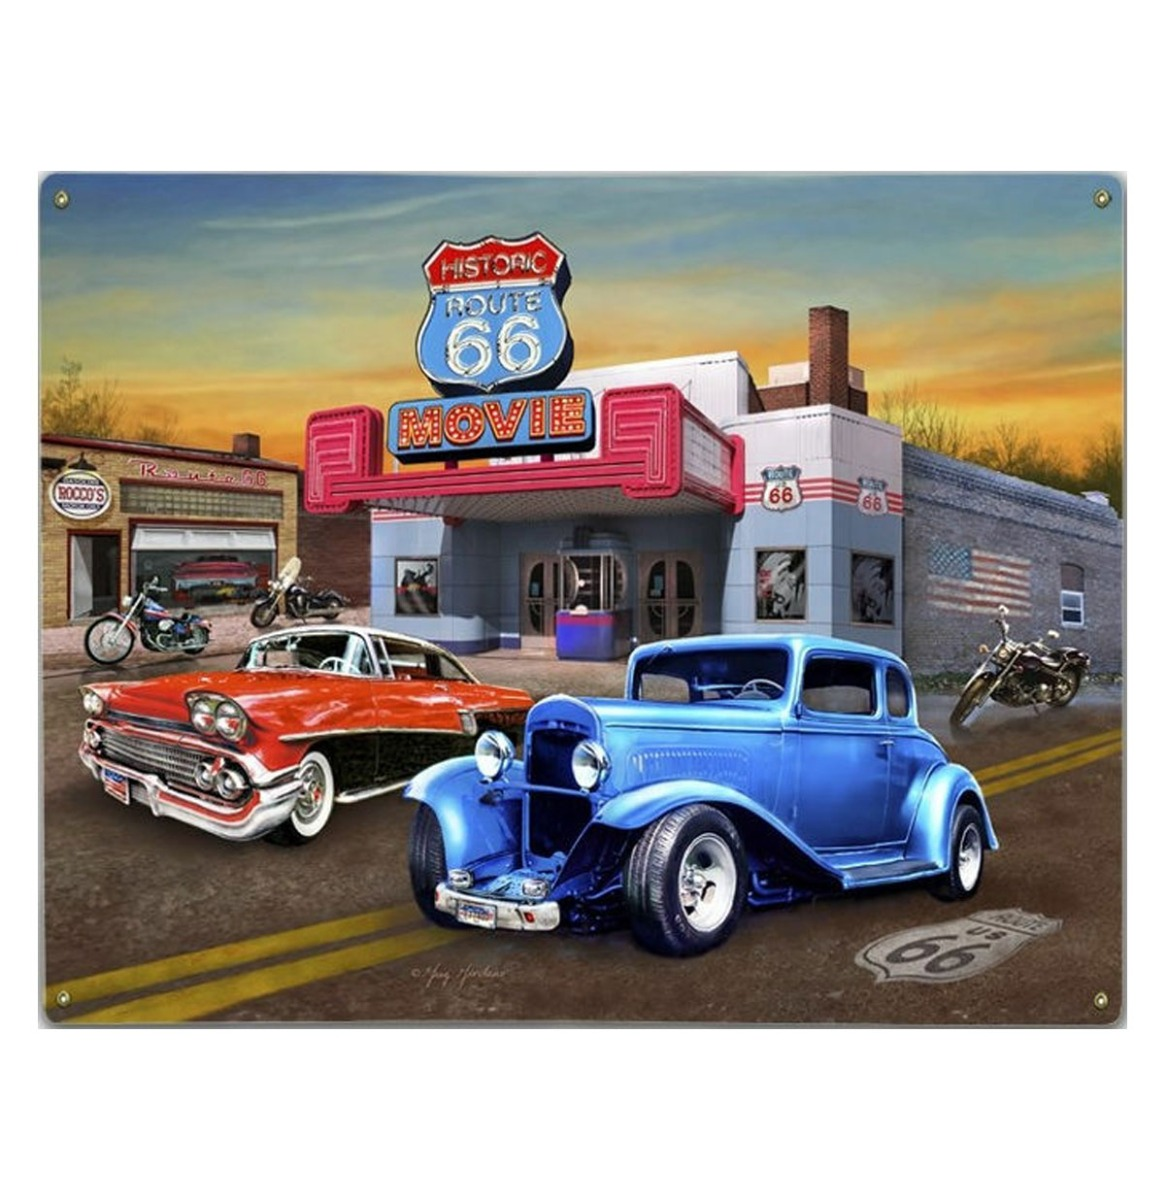 Historic Route 66 Movie - Metalen Bord Met Reliëf - 43 x 31 cm